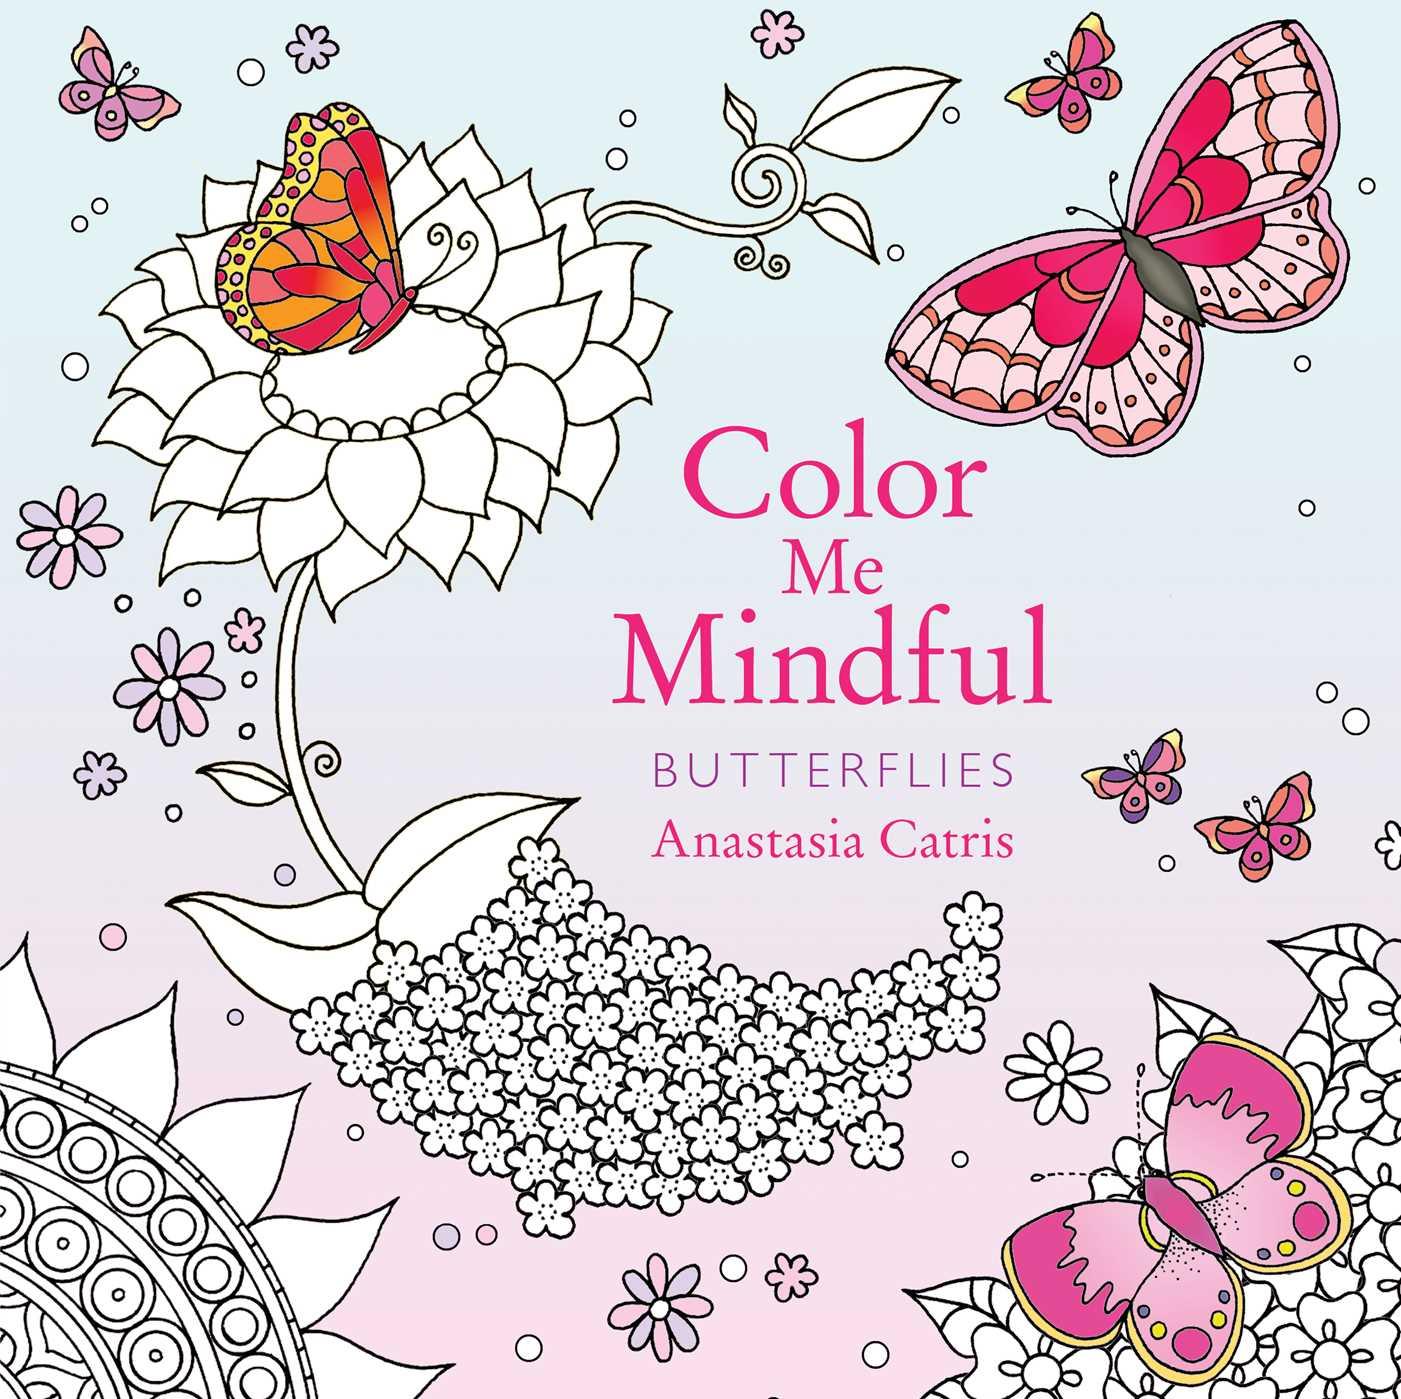 Color me mindful butterflies 9781501162350 hr